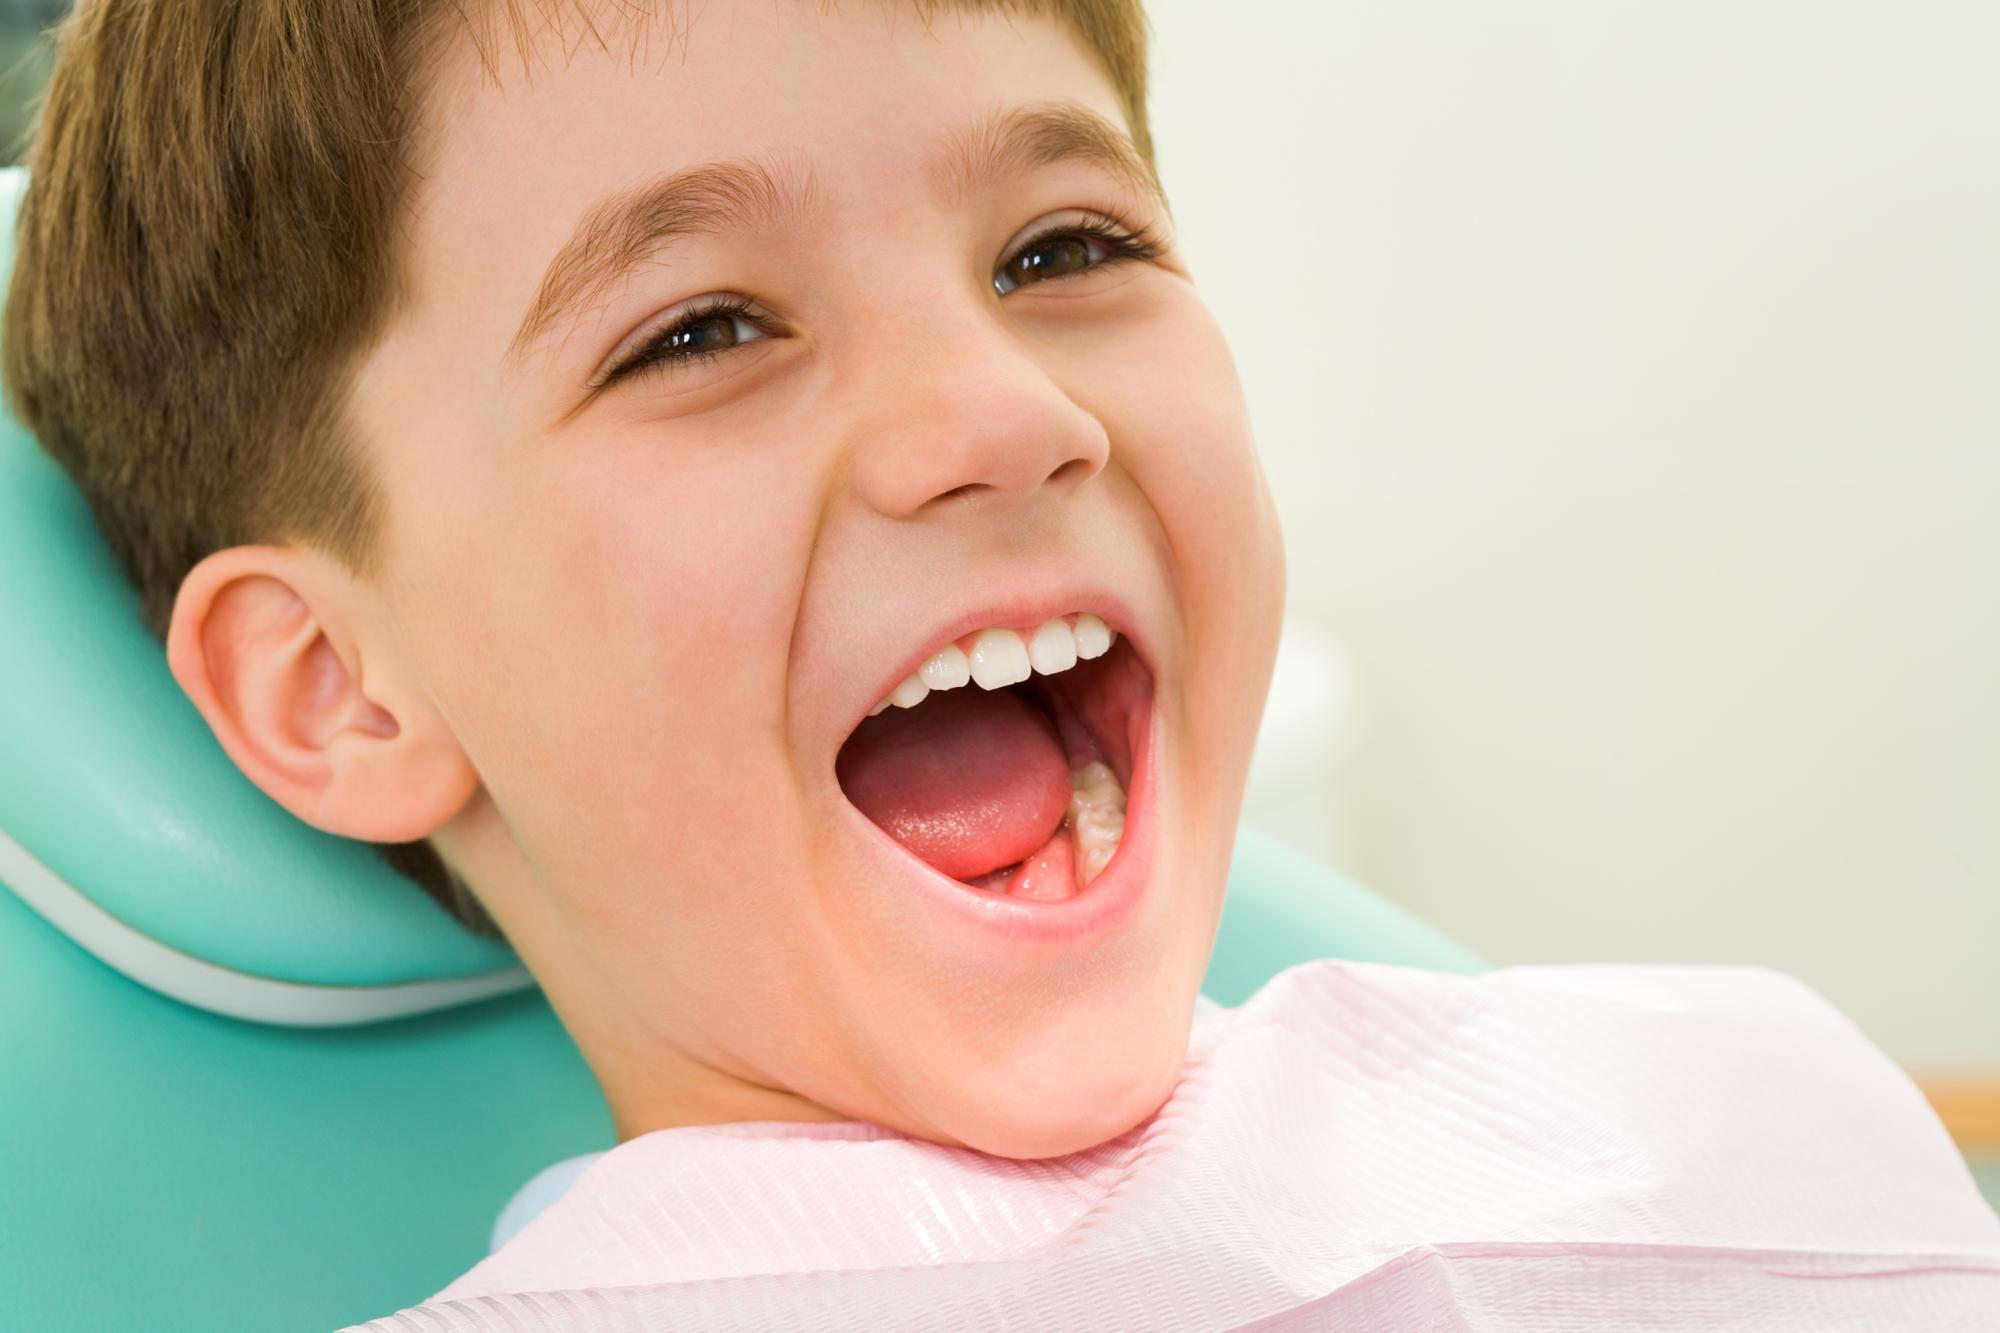 Where can I find a Children's Dentist in Miami